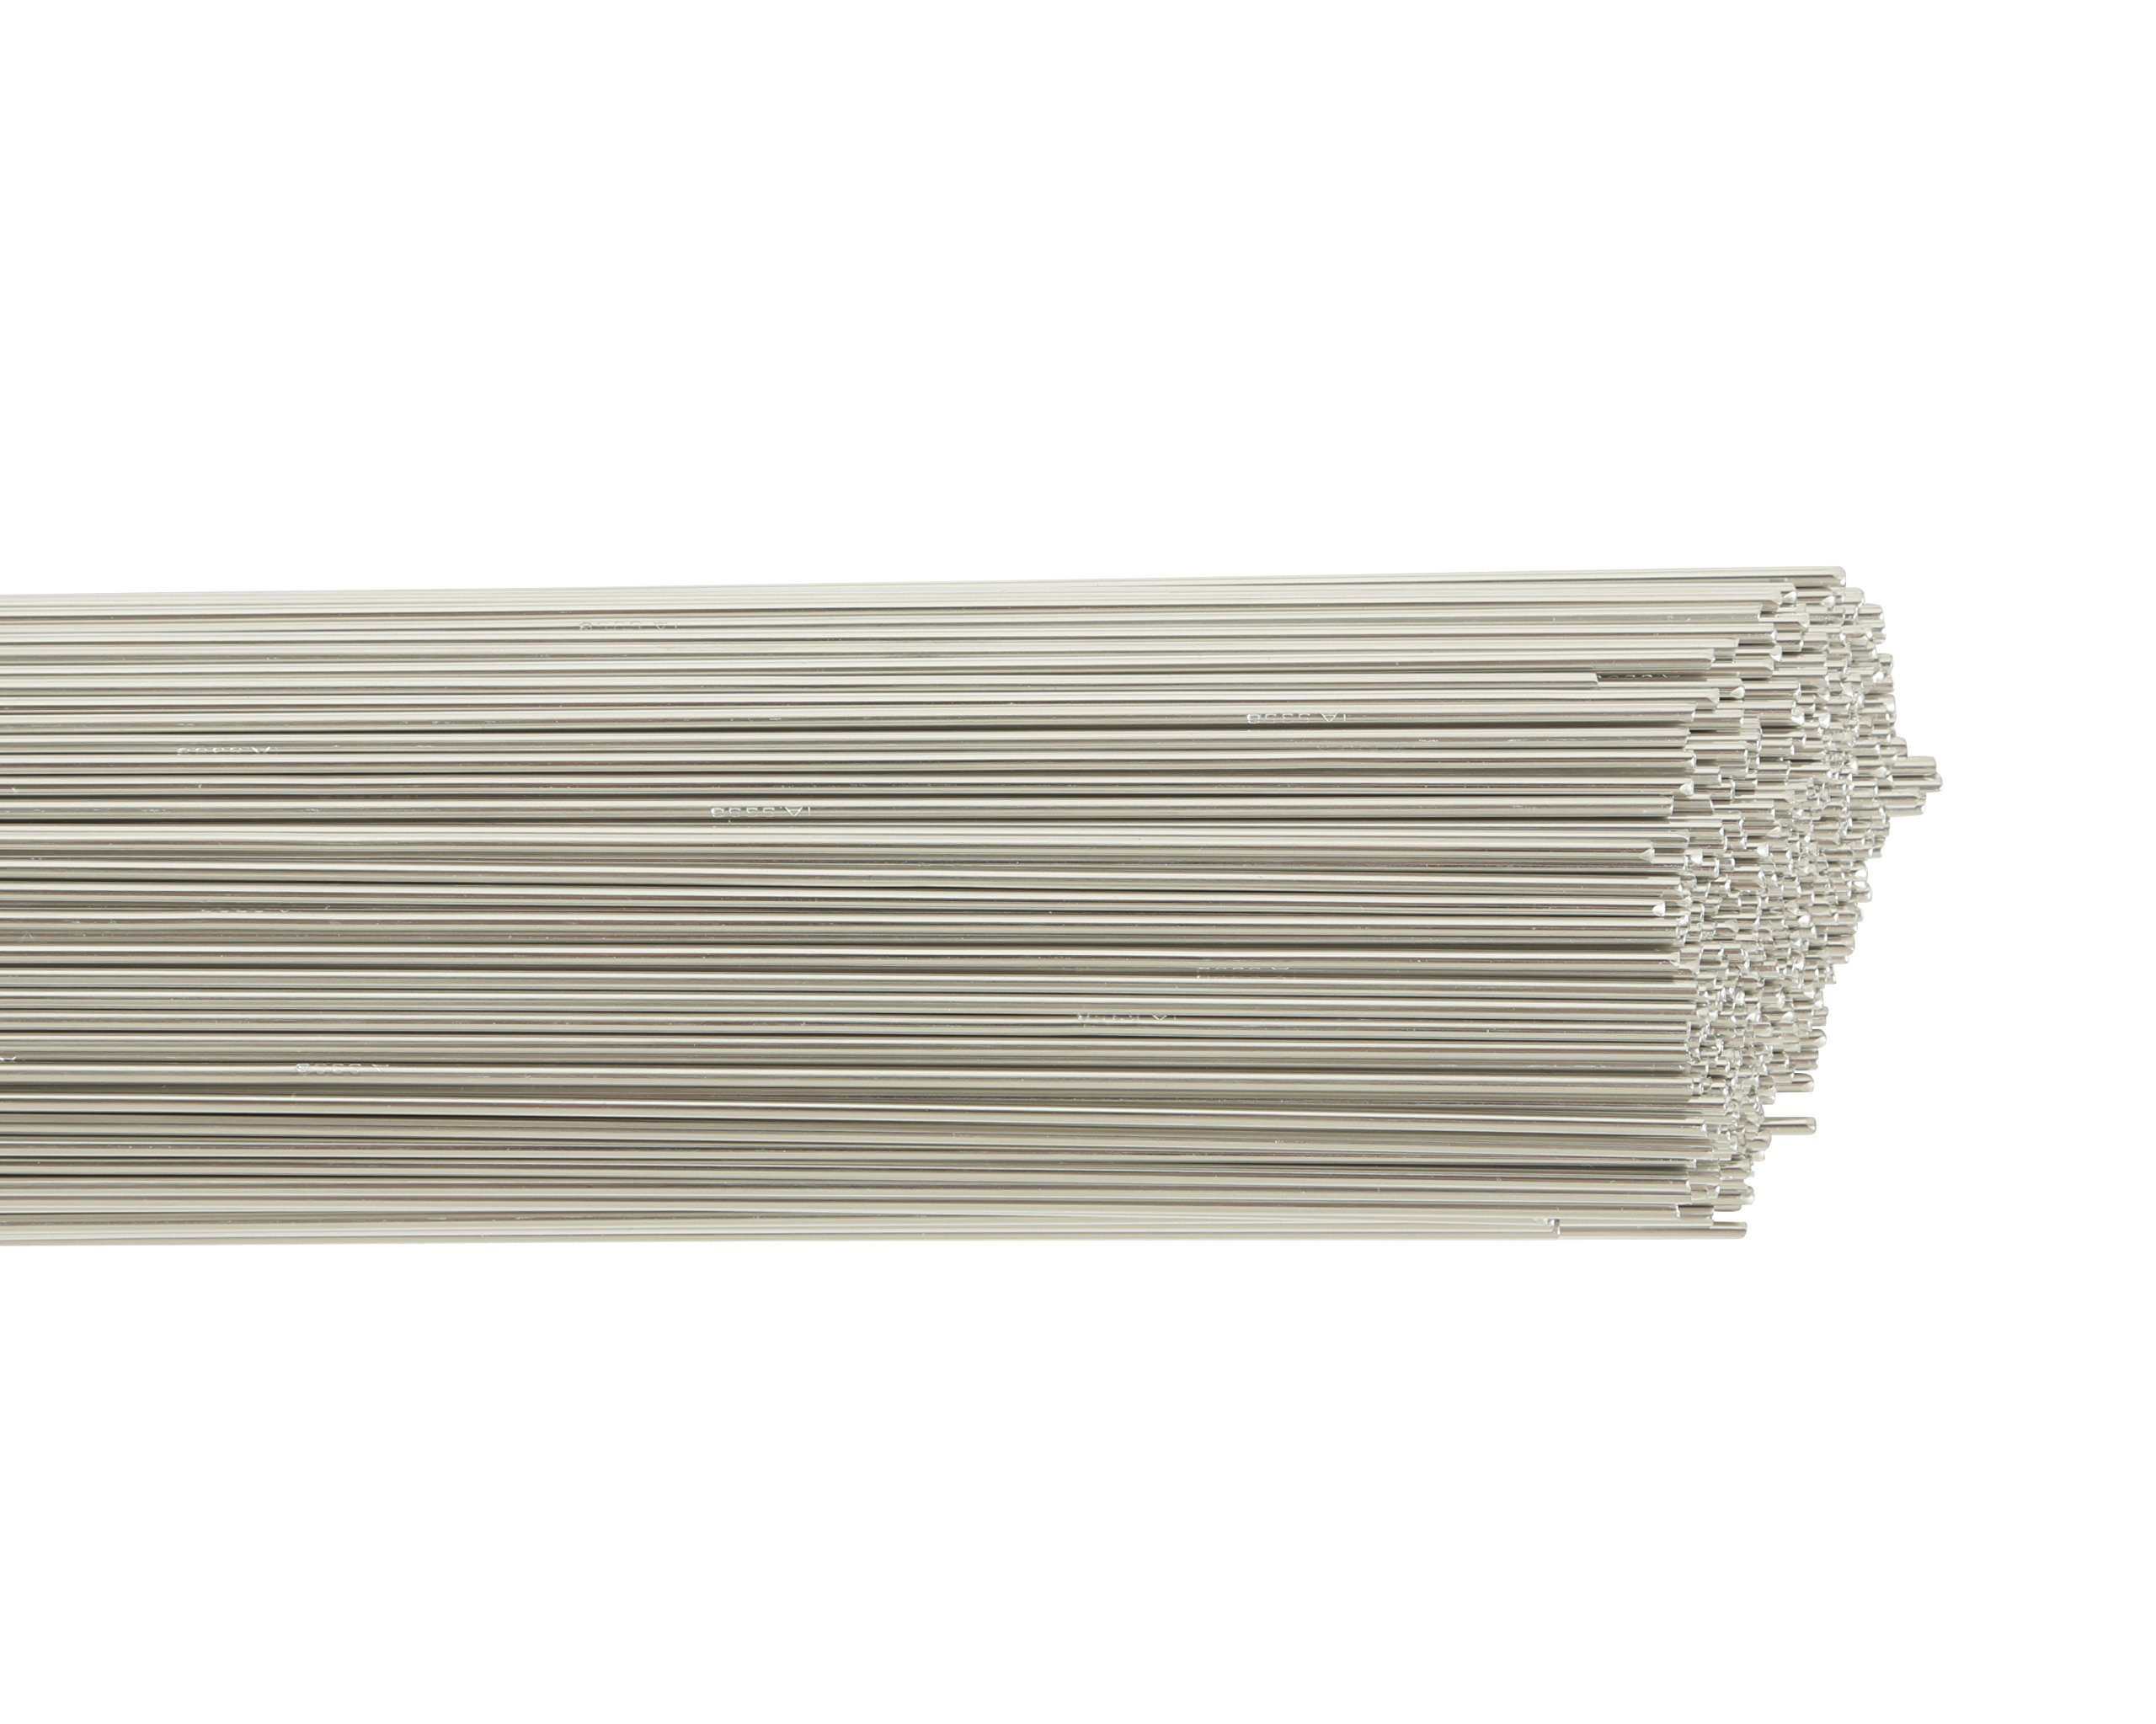 Harris 0535630 5356 Aluminum TIG Welding Rod, 1/16'' x 36'' x 10 lb. Box